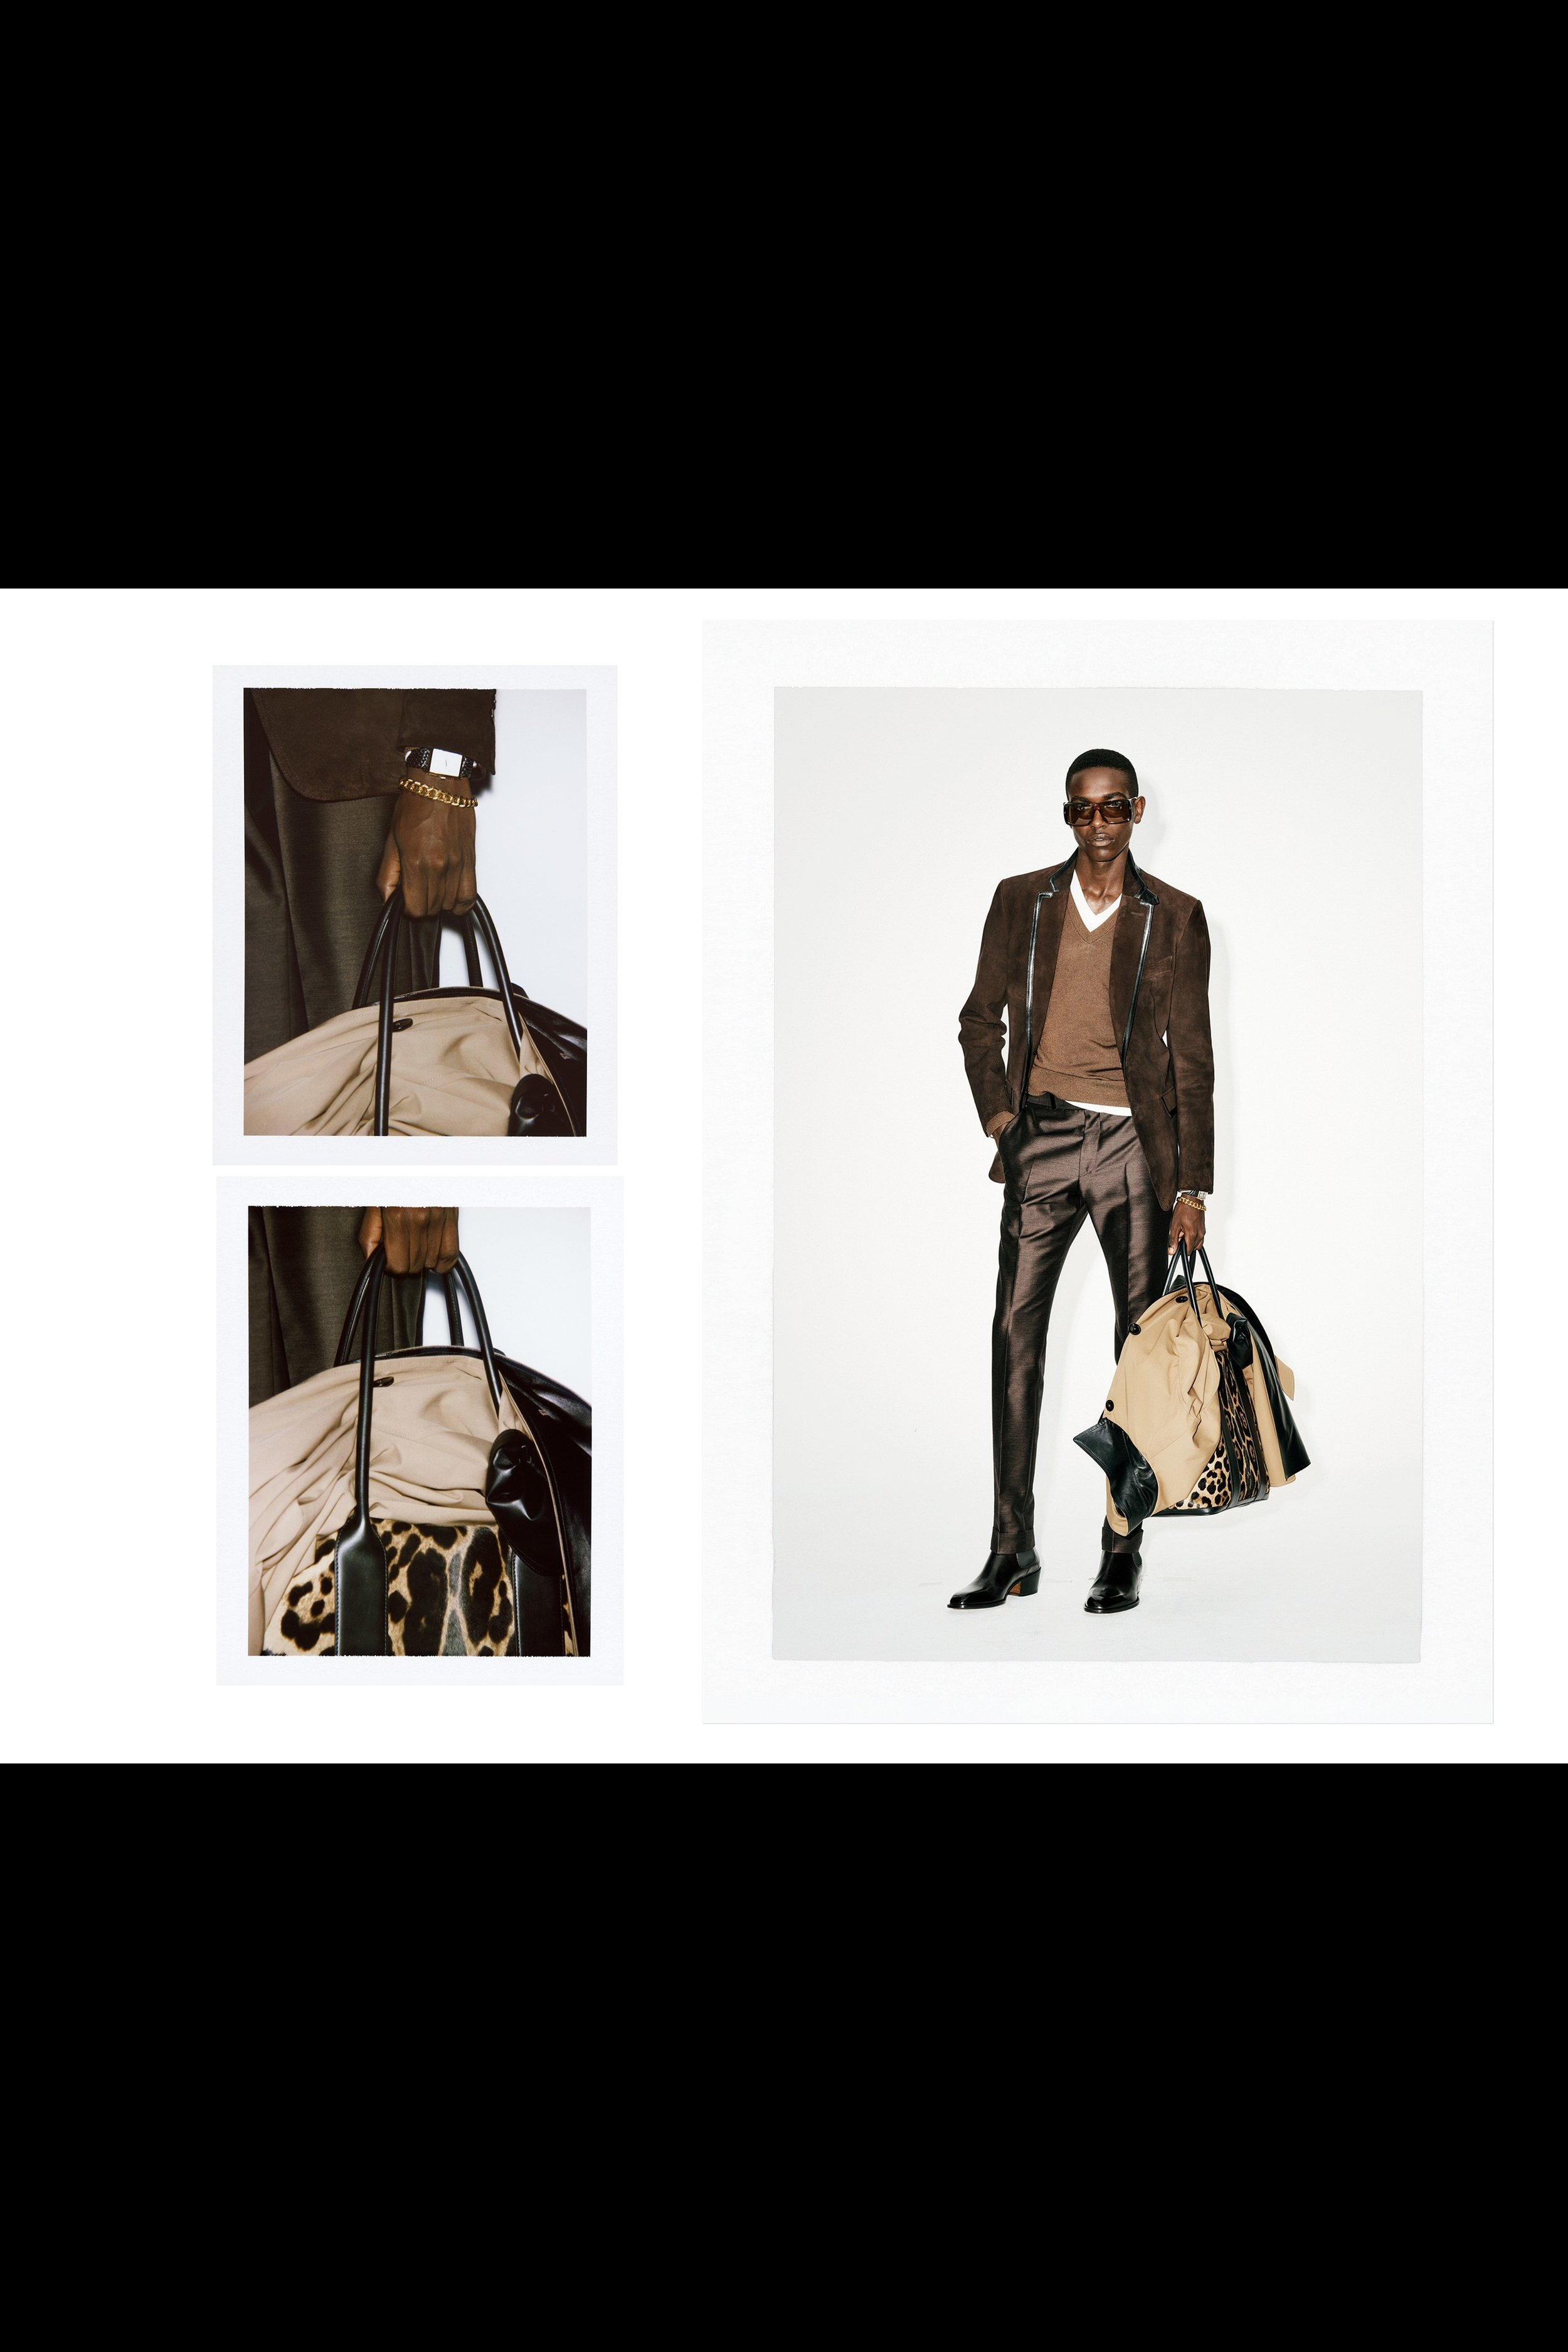 00018-Tom-Ford-vogue-menswear-spring-2019-pr.jpg